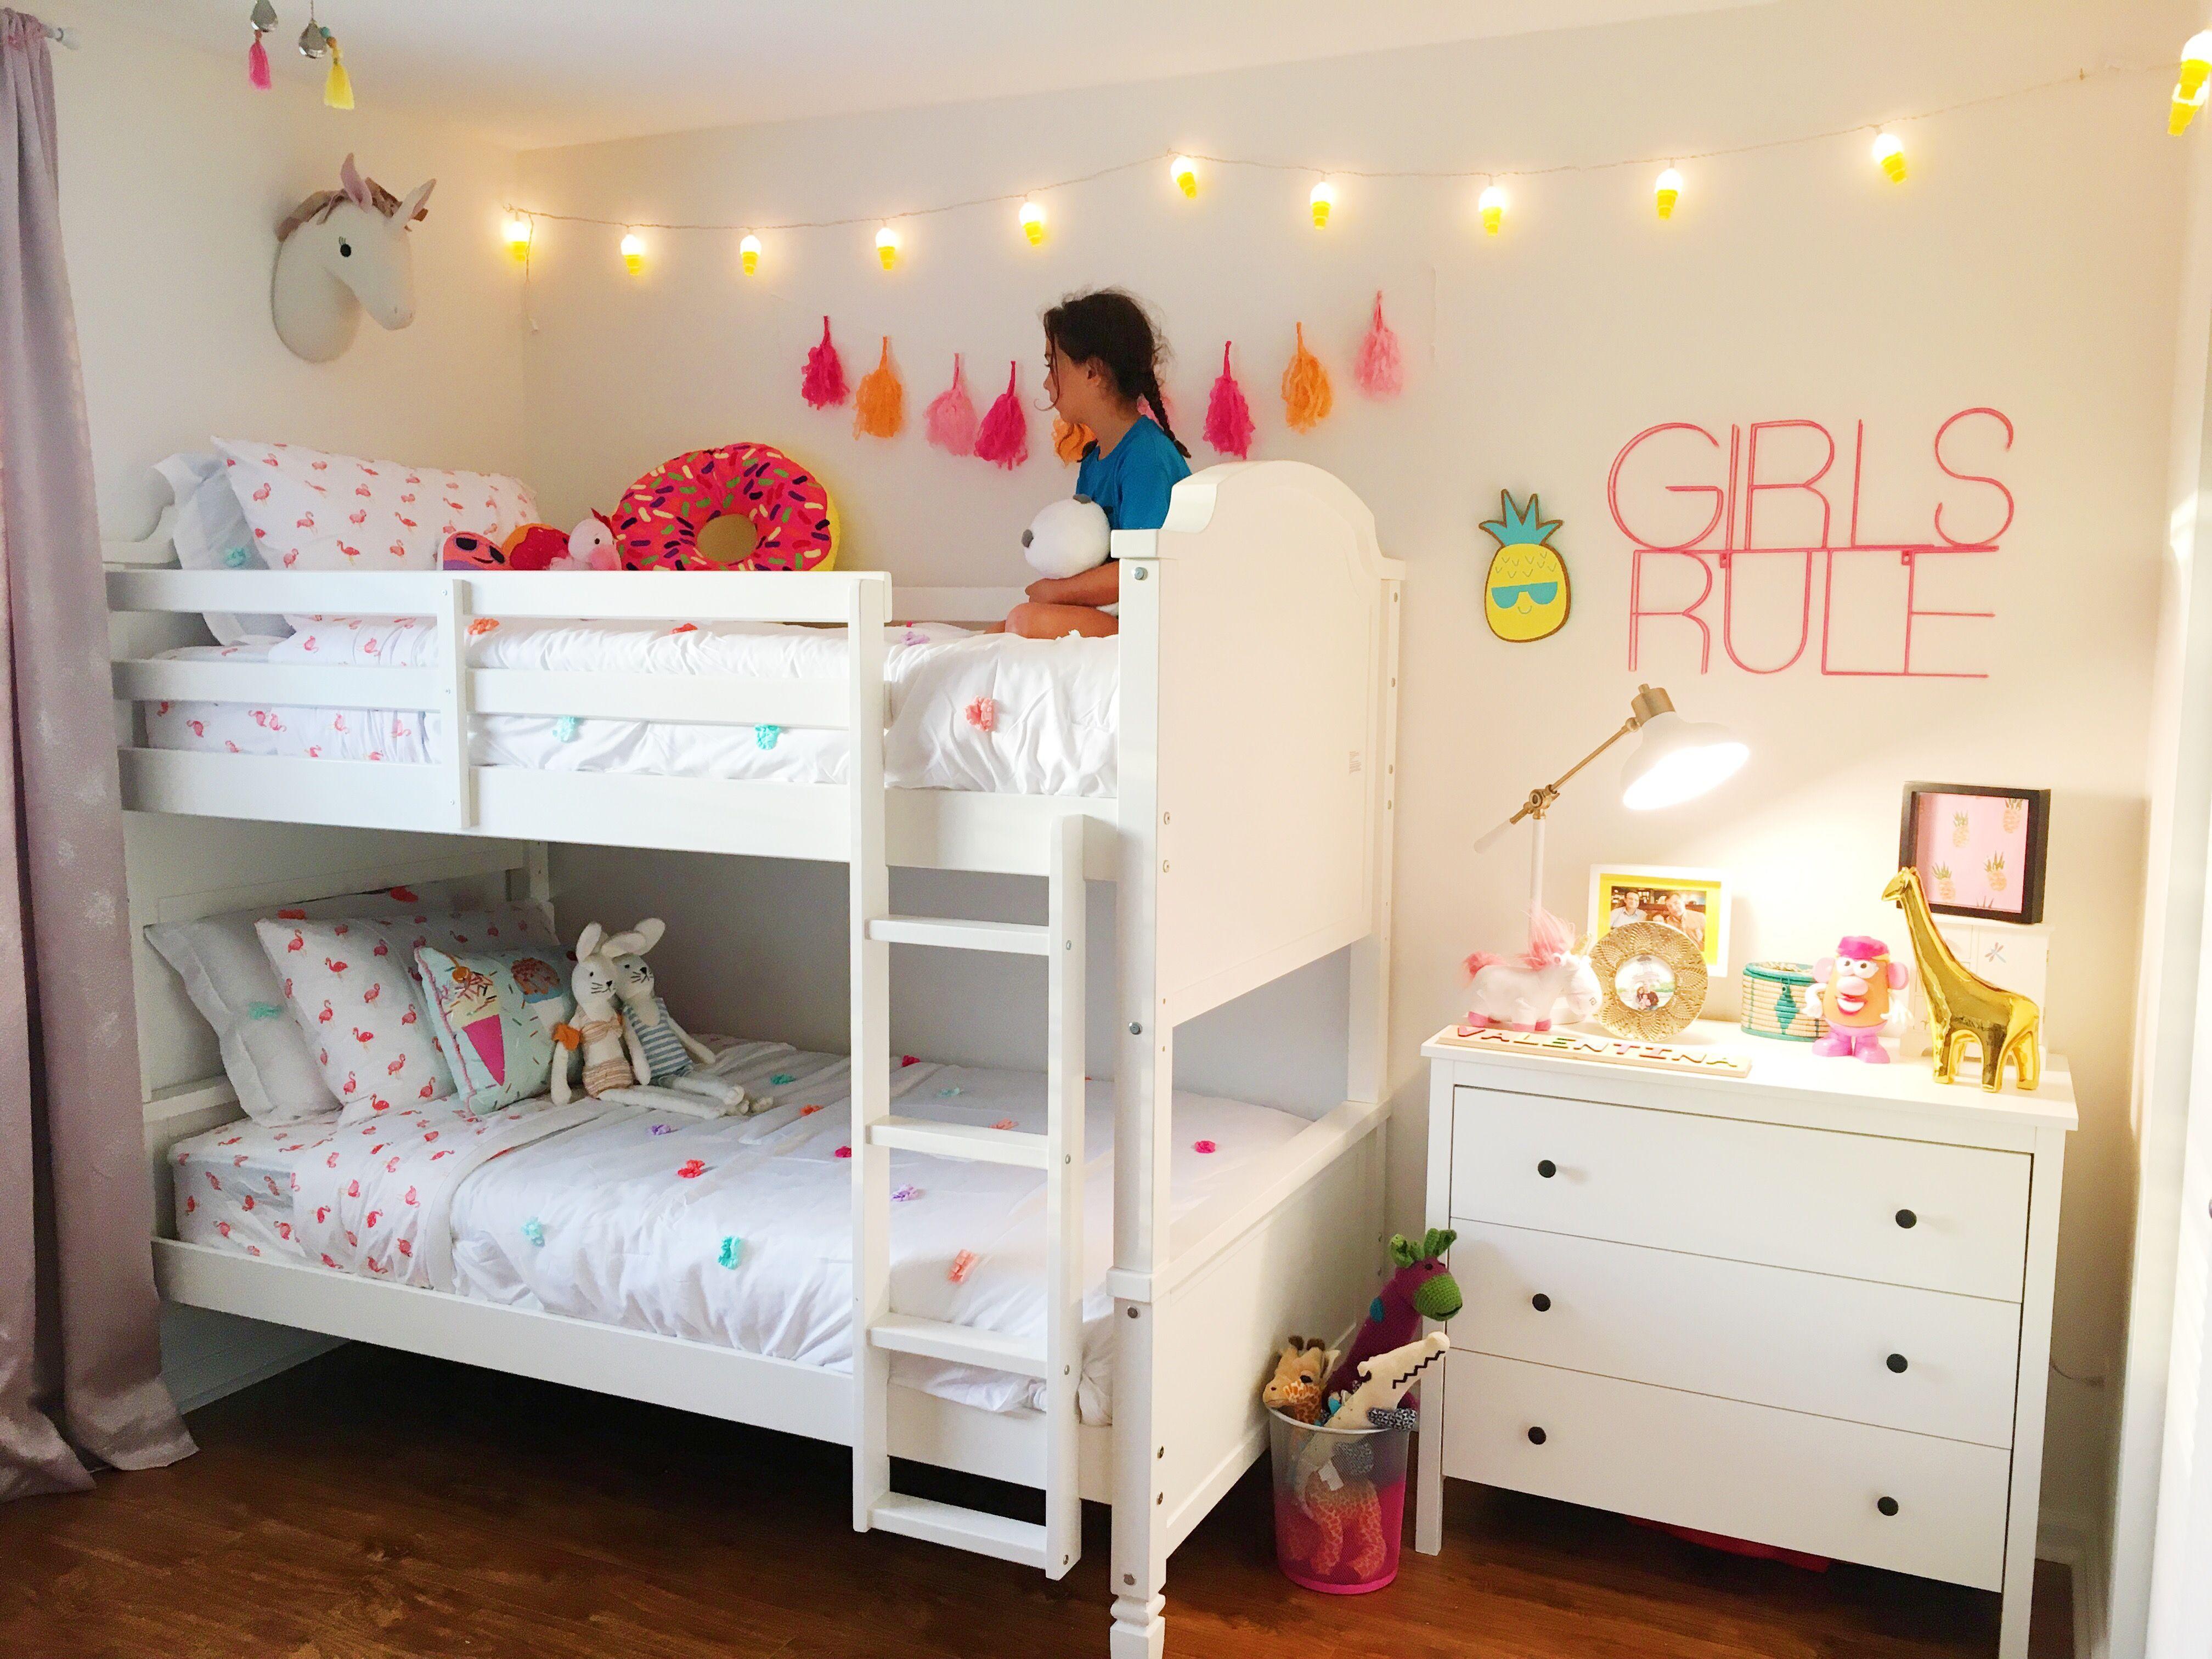 Girls Bunkbed Bedroom Bunkbeds Bedroom Interior Pink White